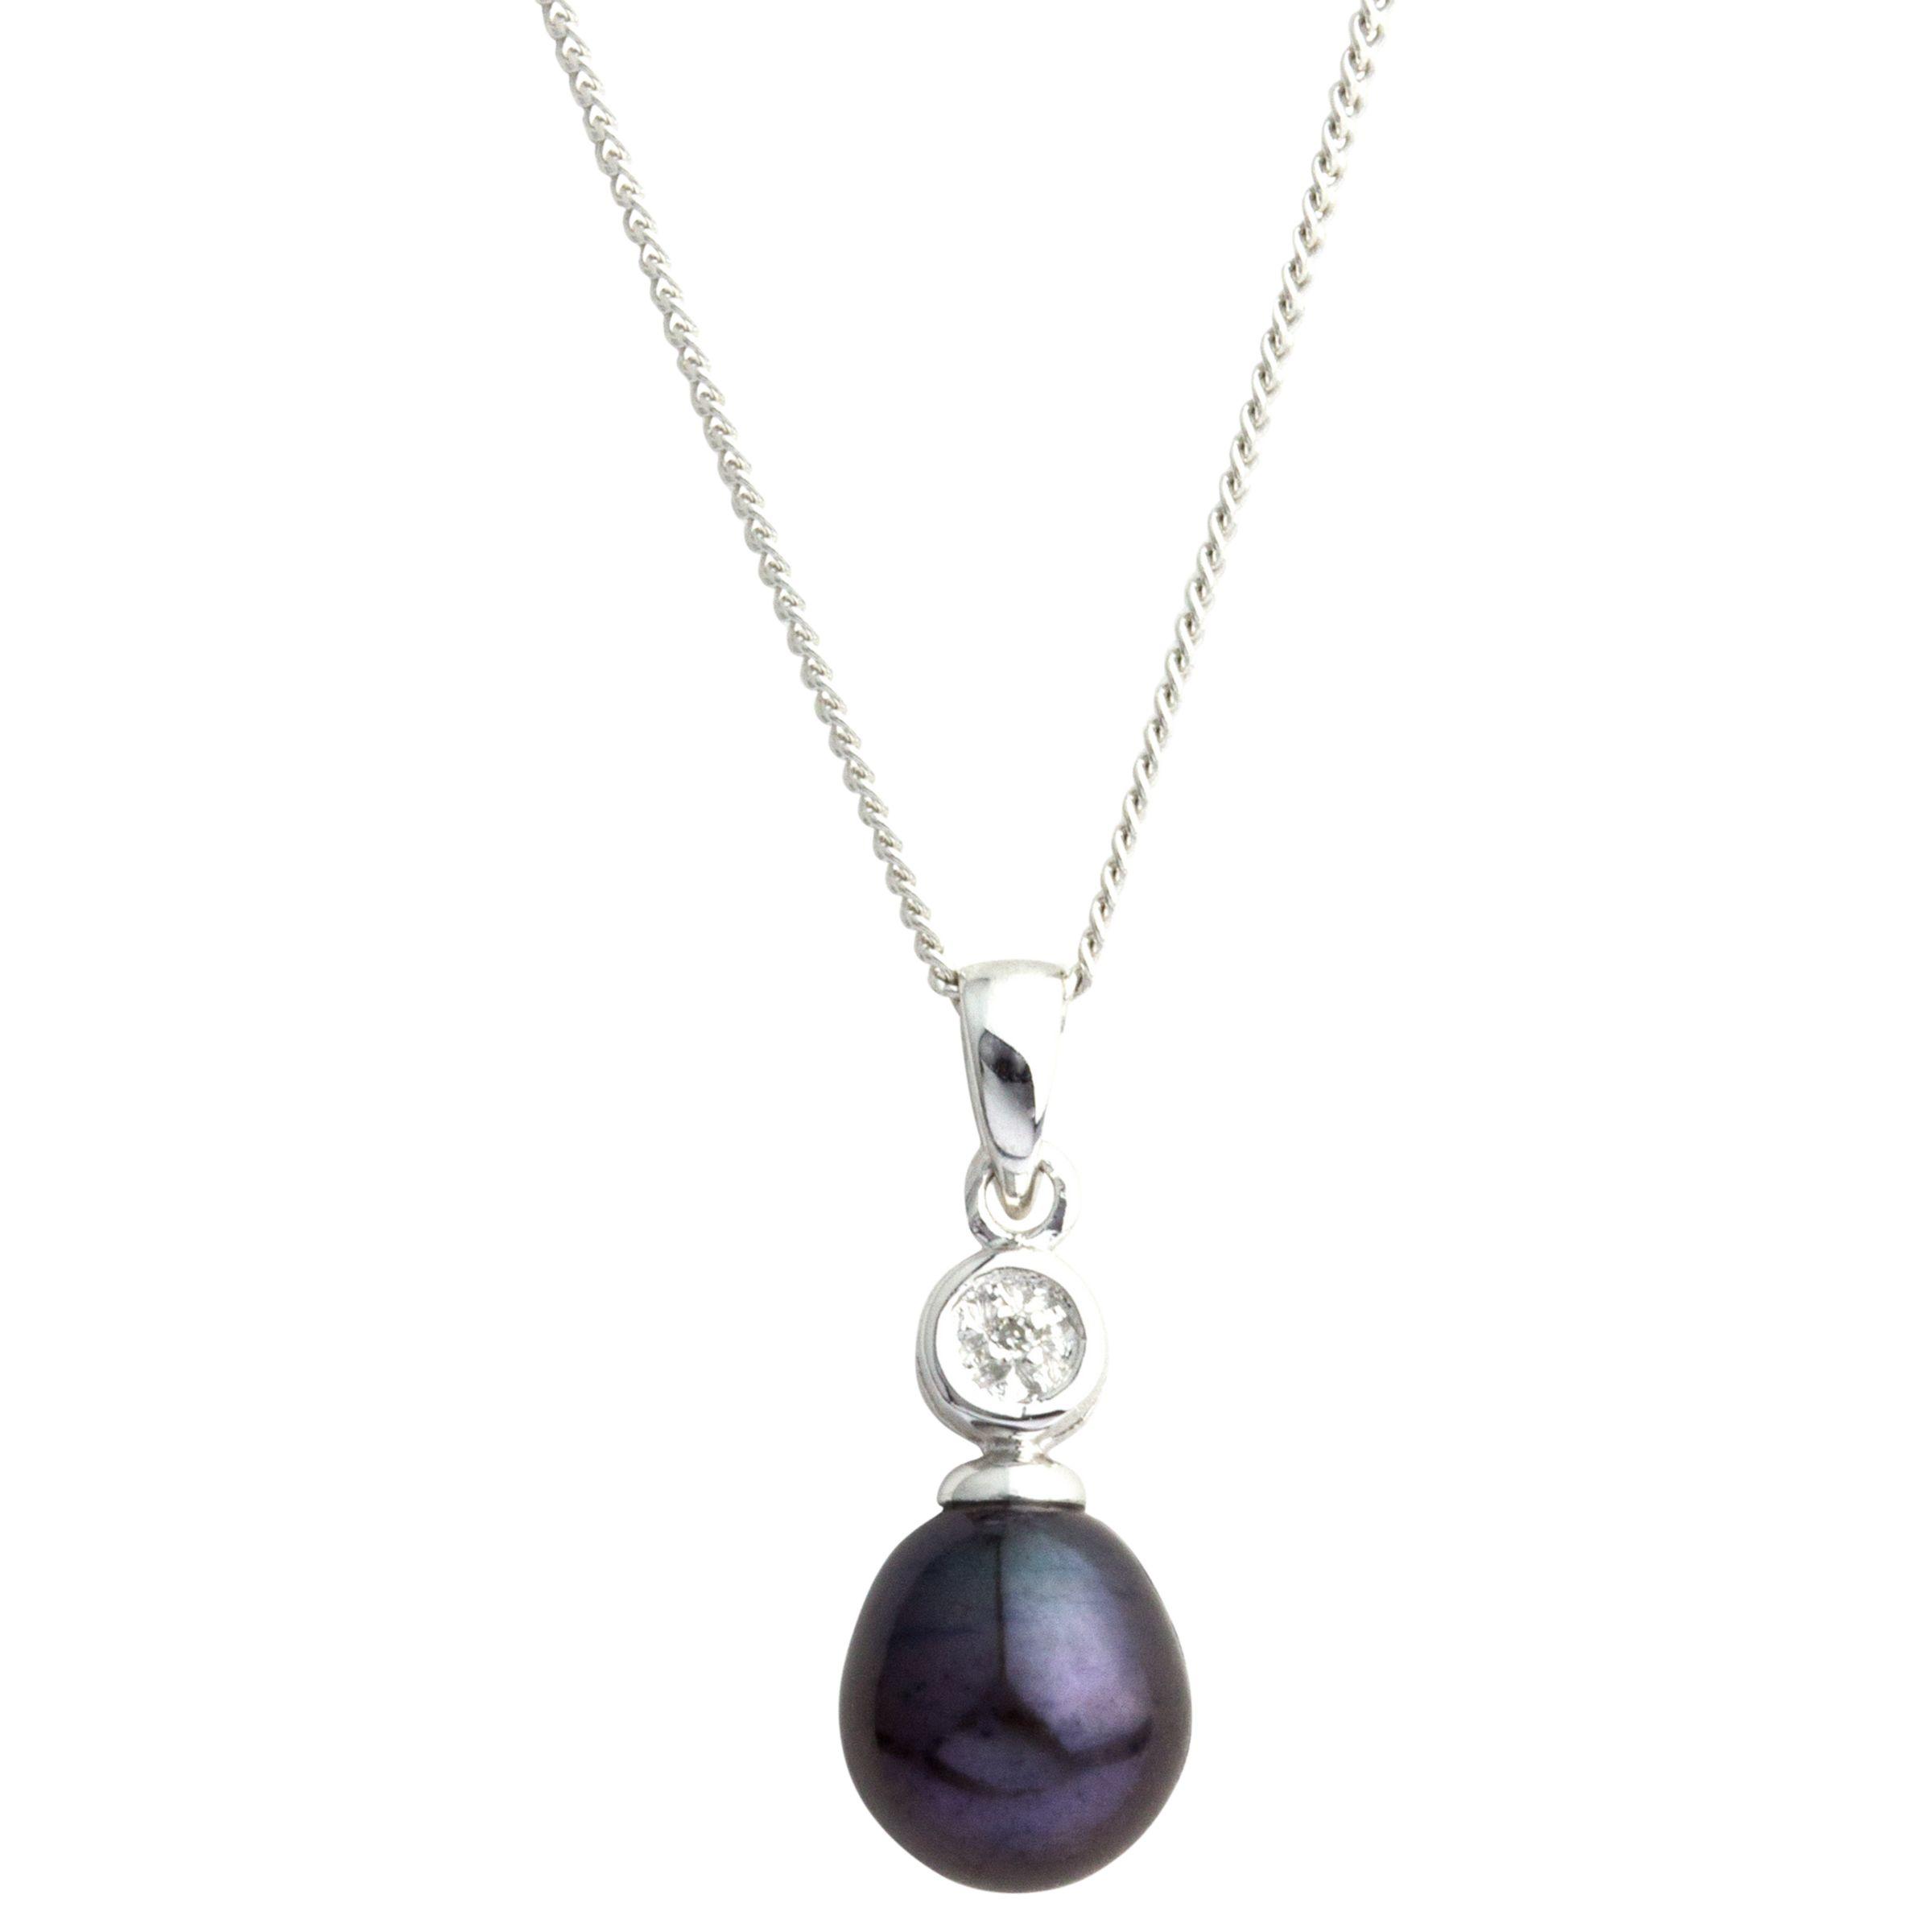 A B Davis A B Davis 9ct White Gold Pearl Pendant Necklace